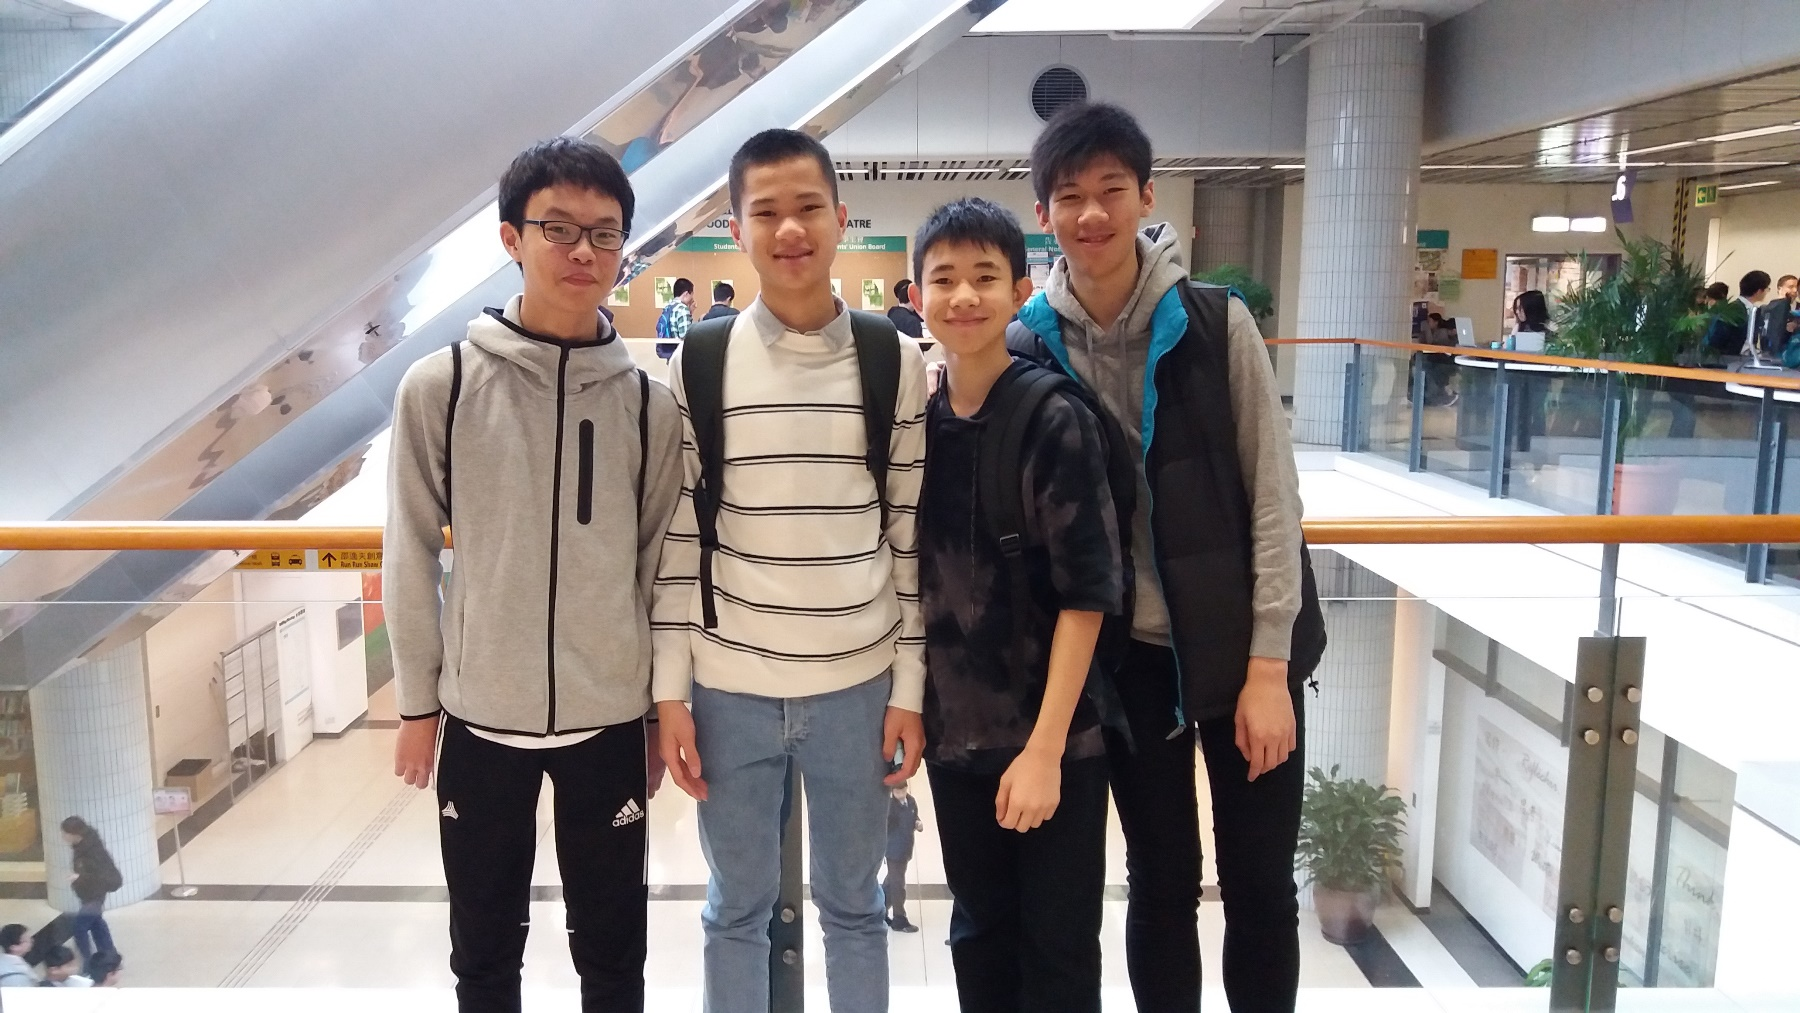 https://www.npc.edu.hk/sites/default/files/20180325_104621.jpg